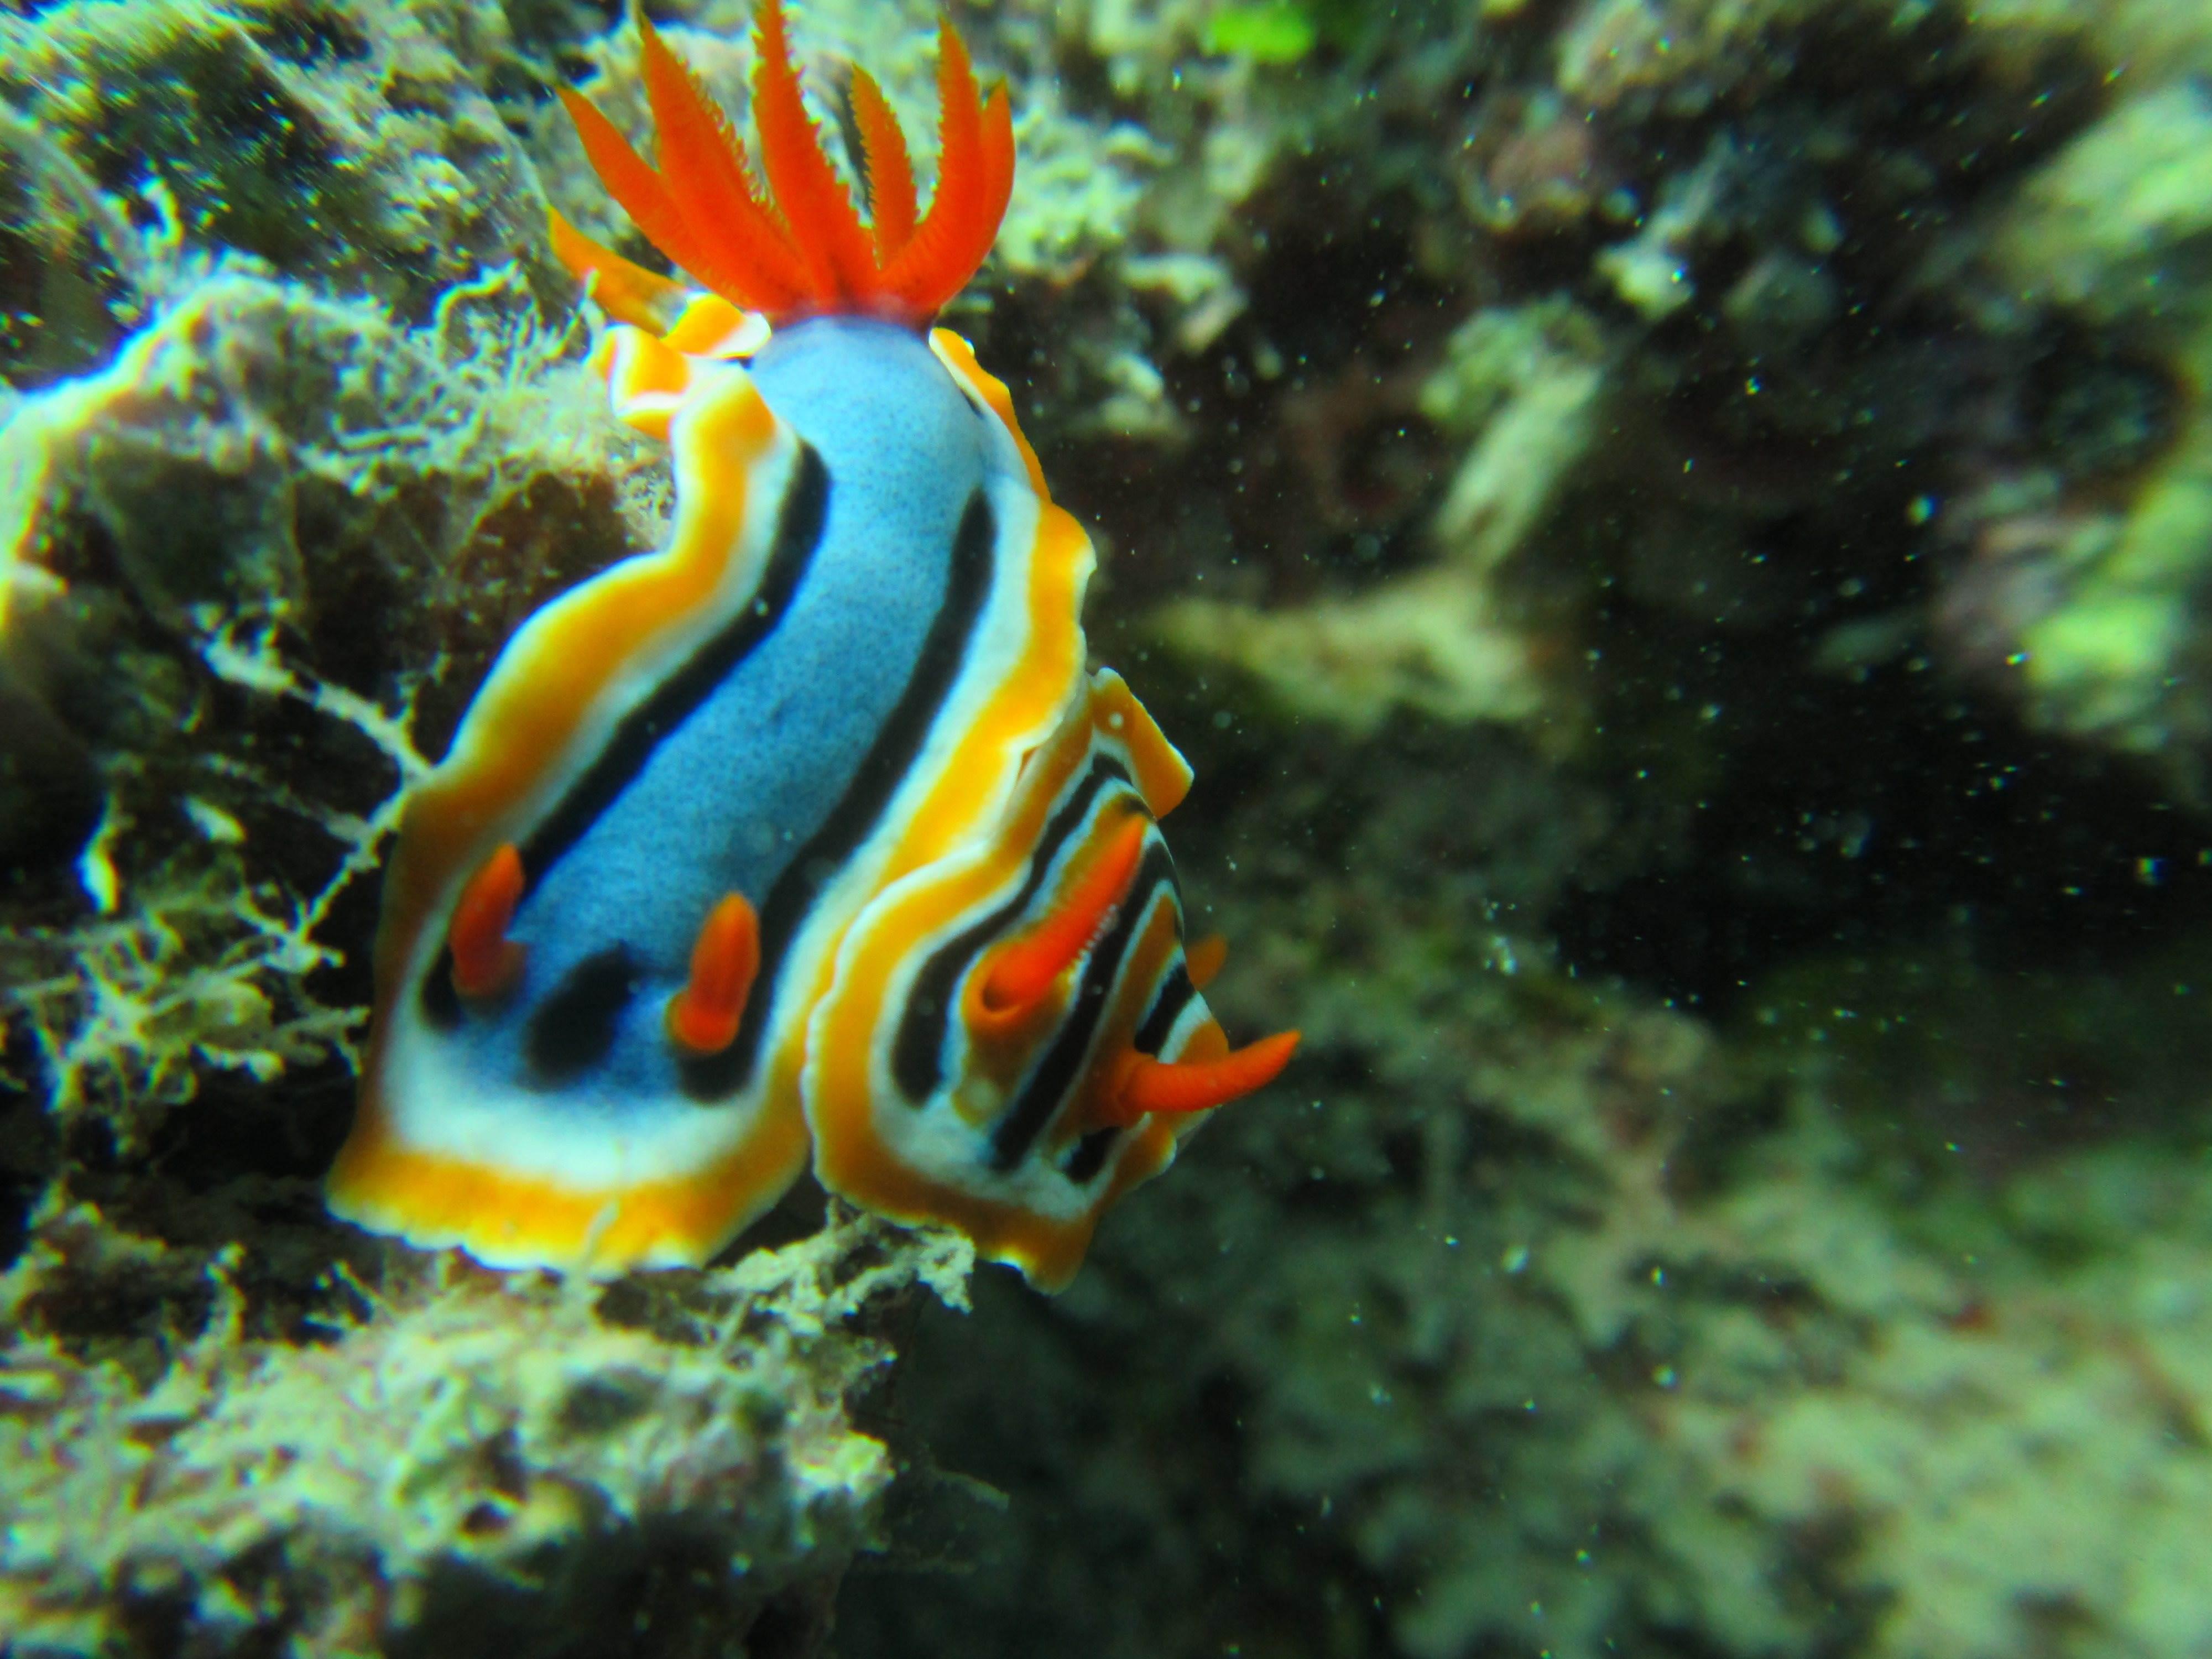 Benthos pada ekosistem terumbu karang